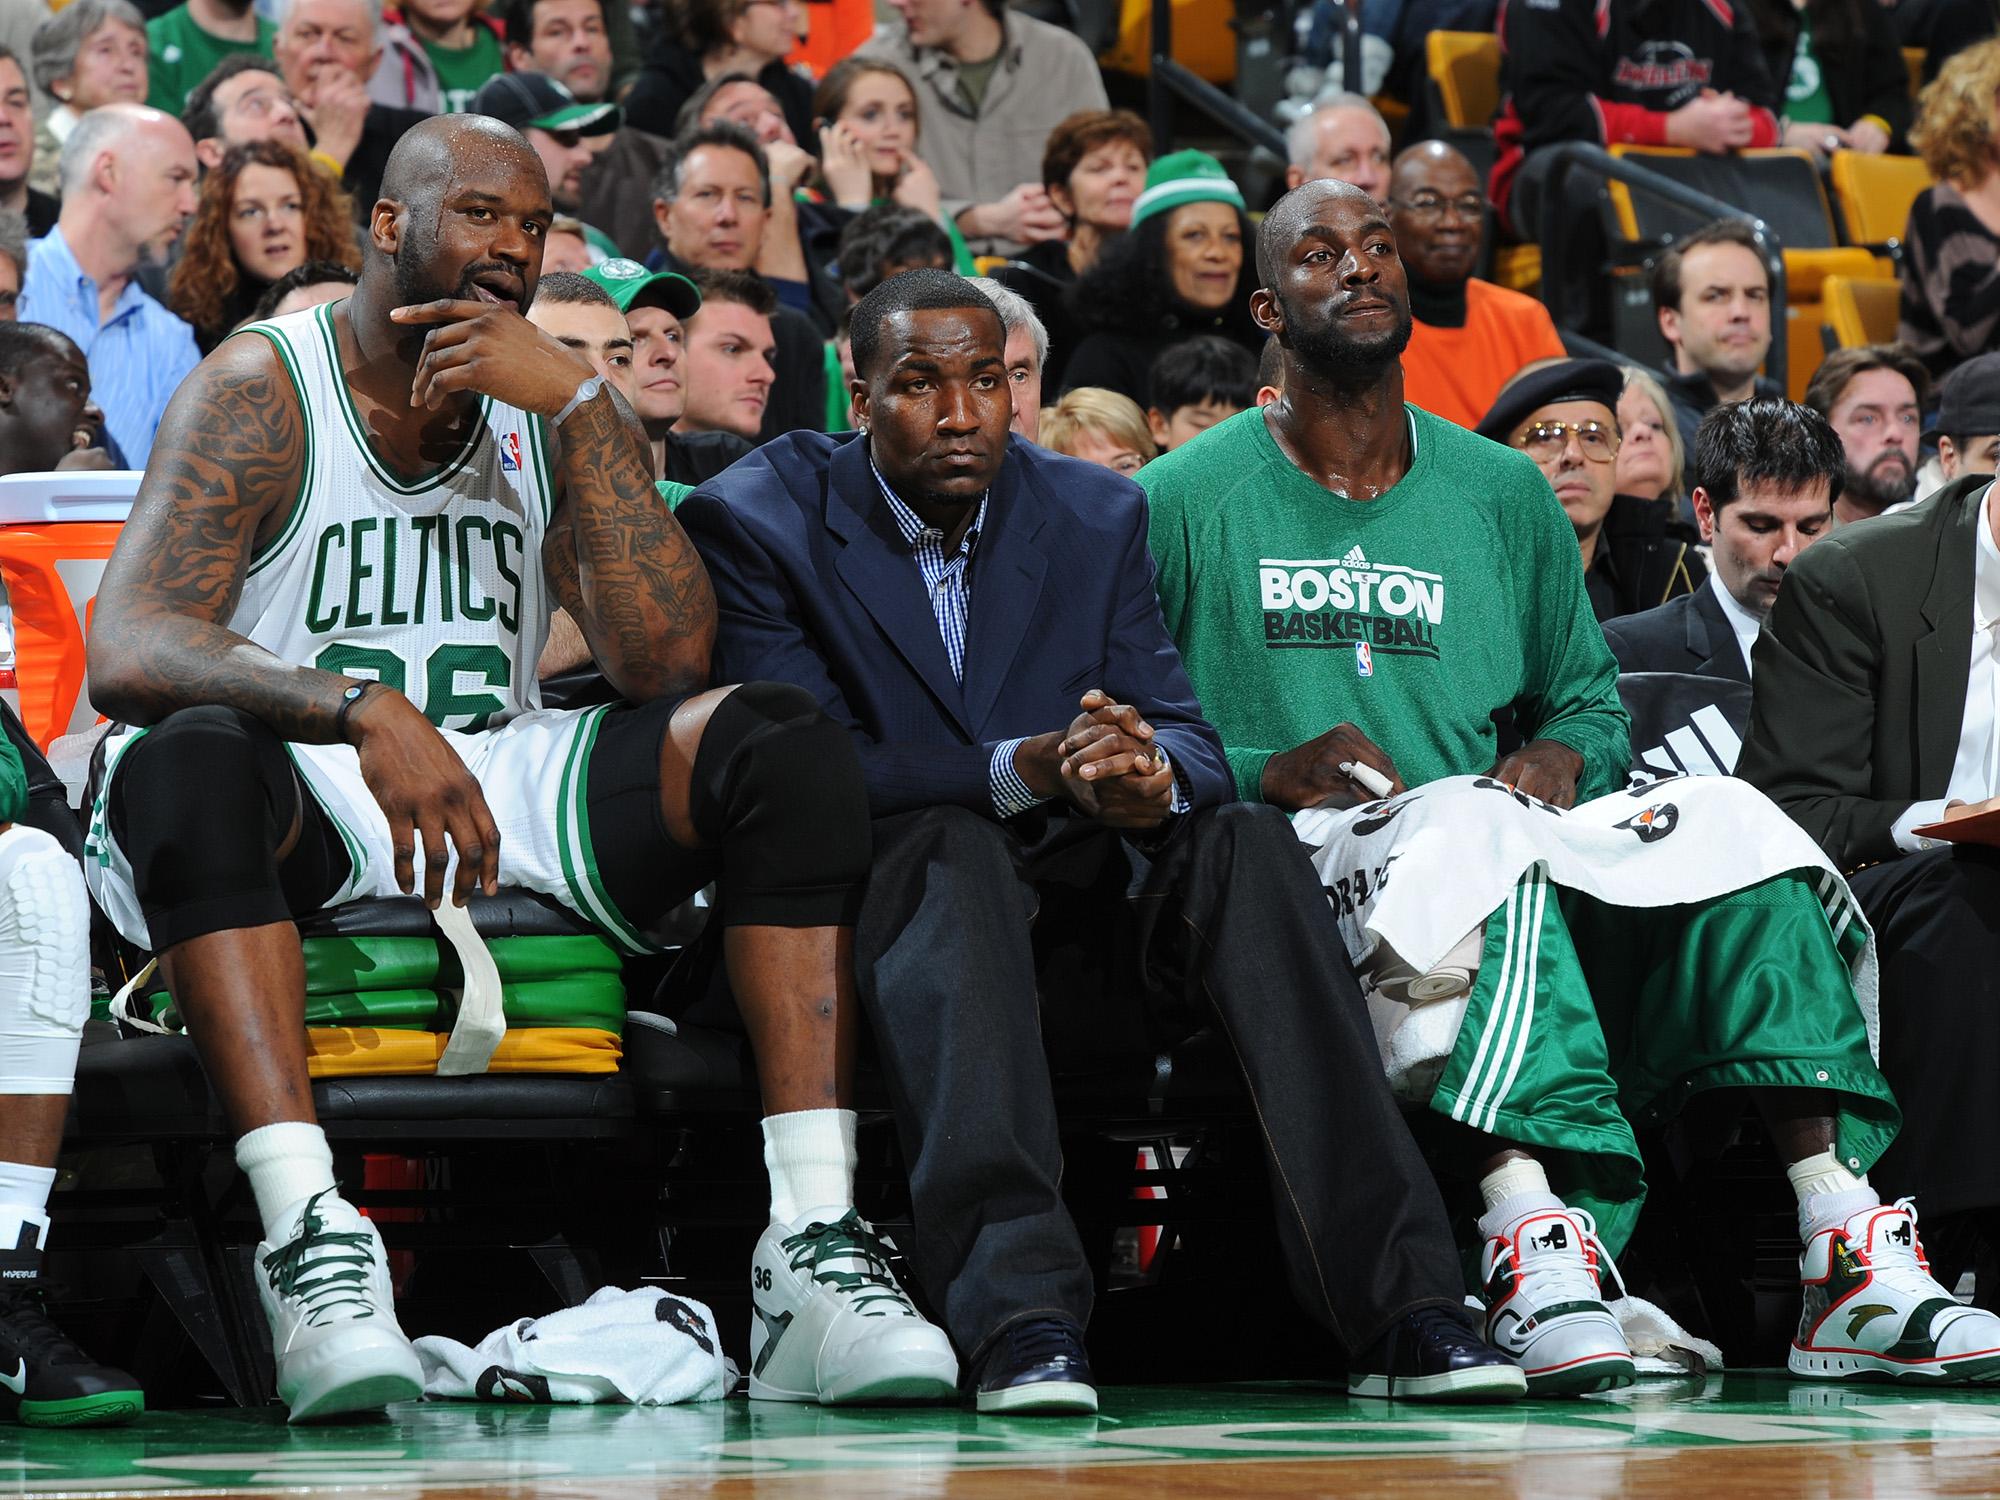 Chicago's Butler stuns Boston in National Basketball Association